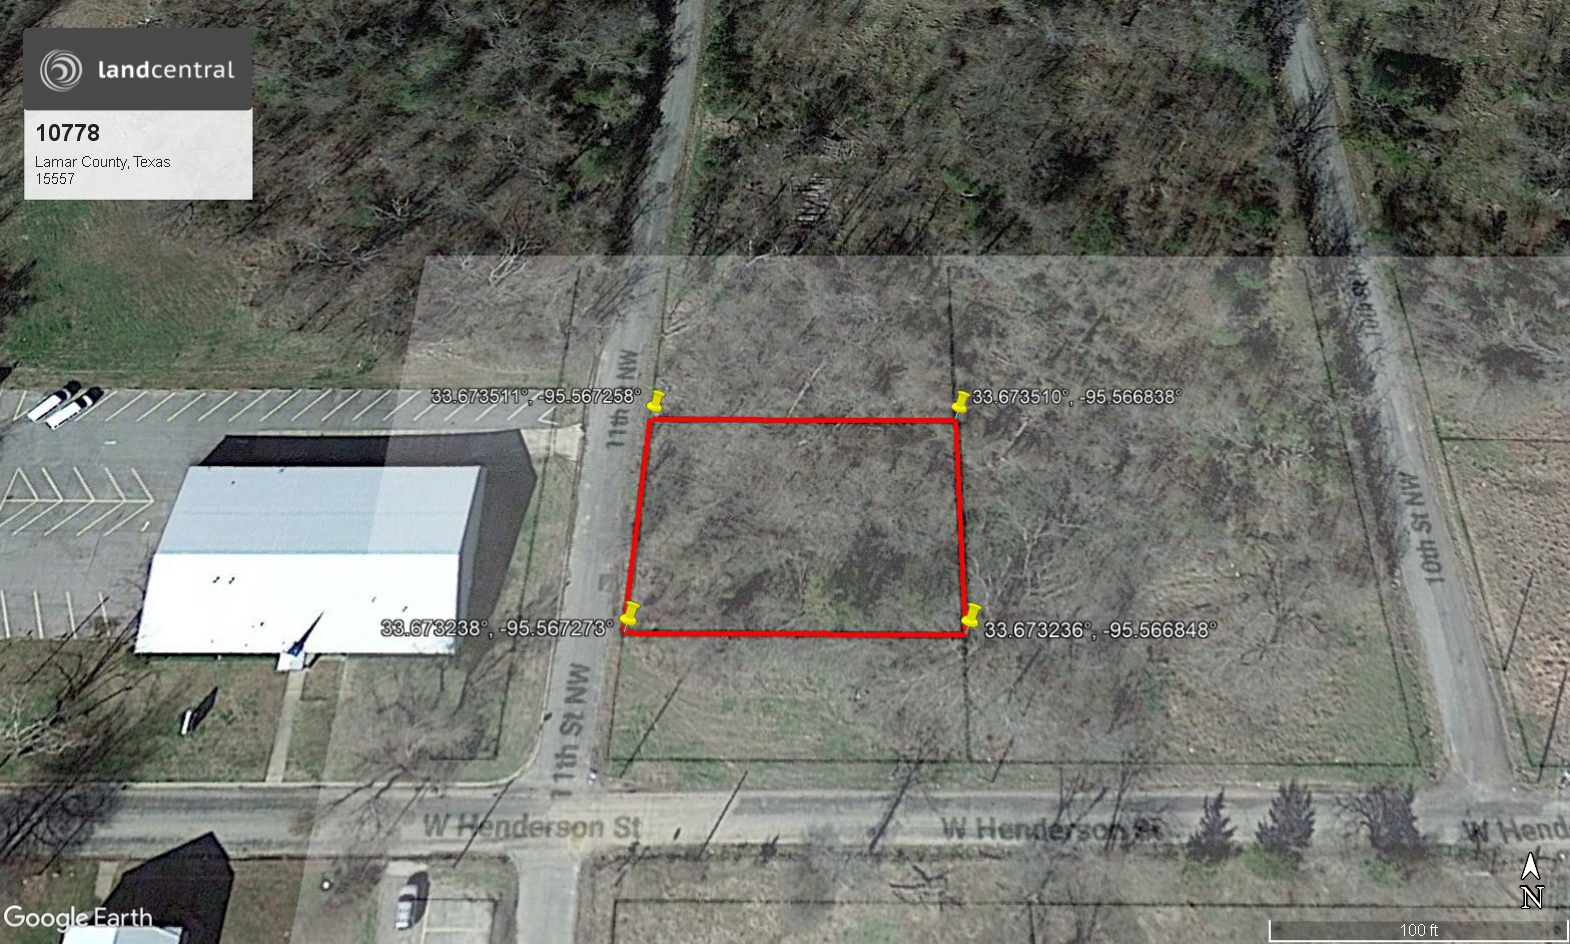 More than Quarter Acre of Prime Real Estate | LandCentral